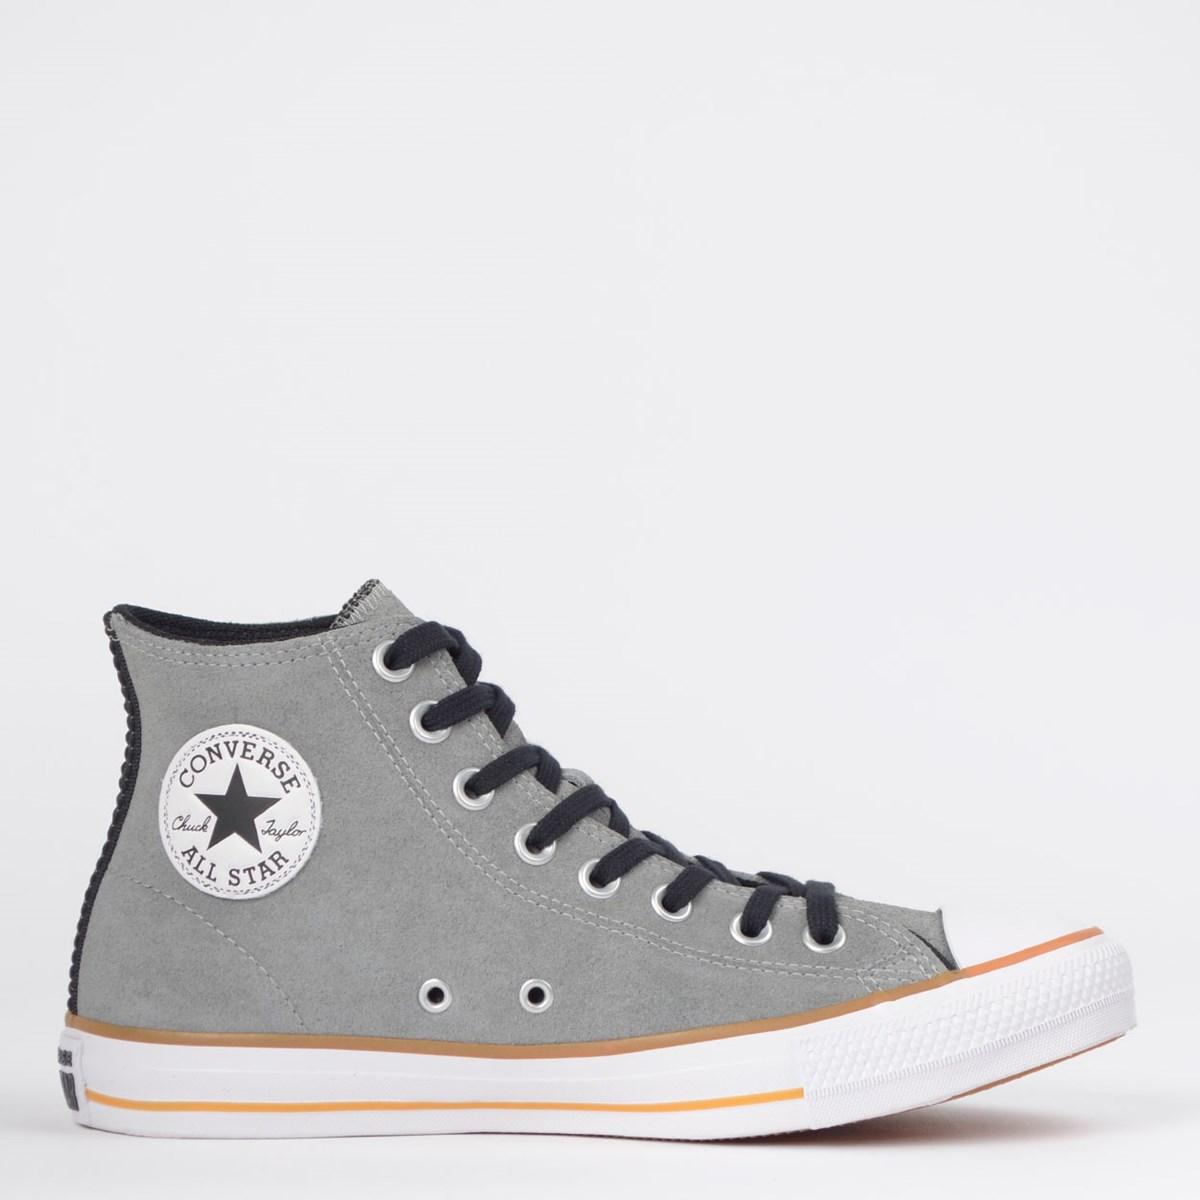 Tênis Converse Chuck Taylor All Star SKT Hi Aluminio Preto CT14260004